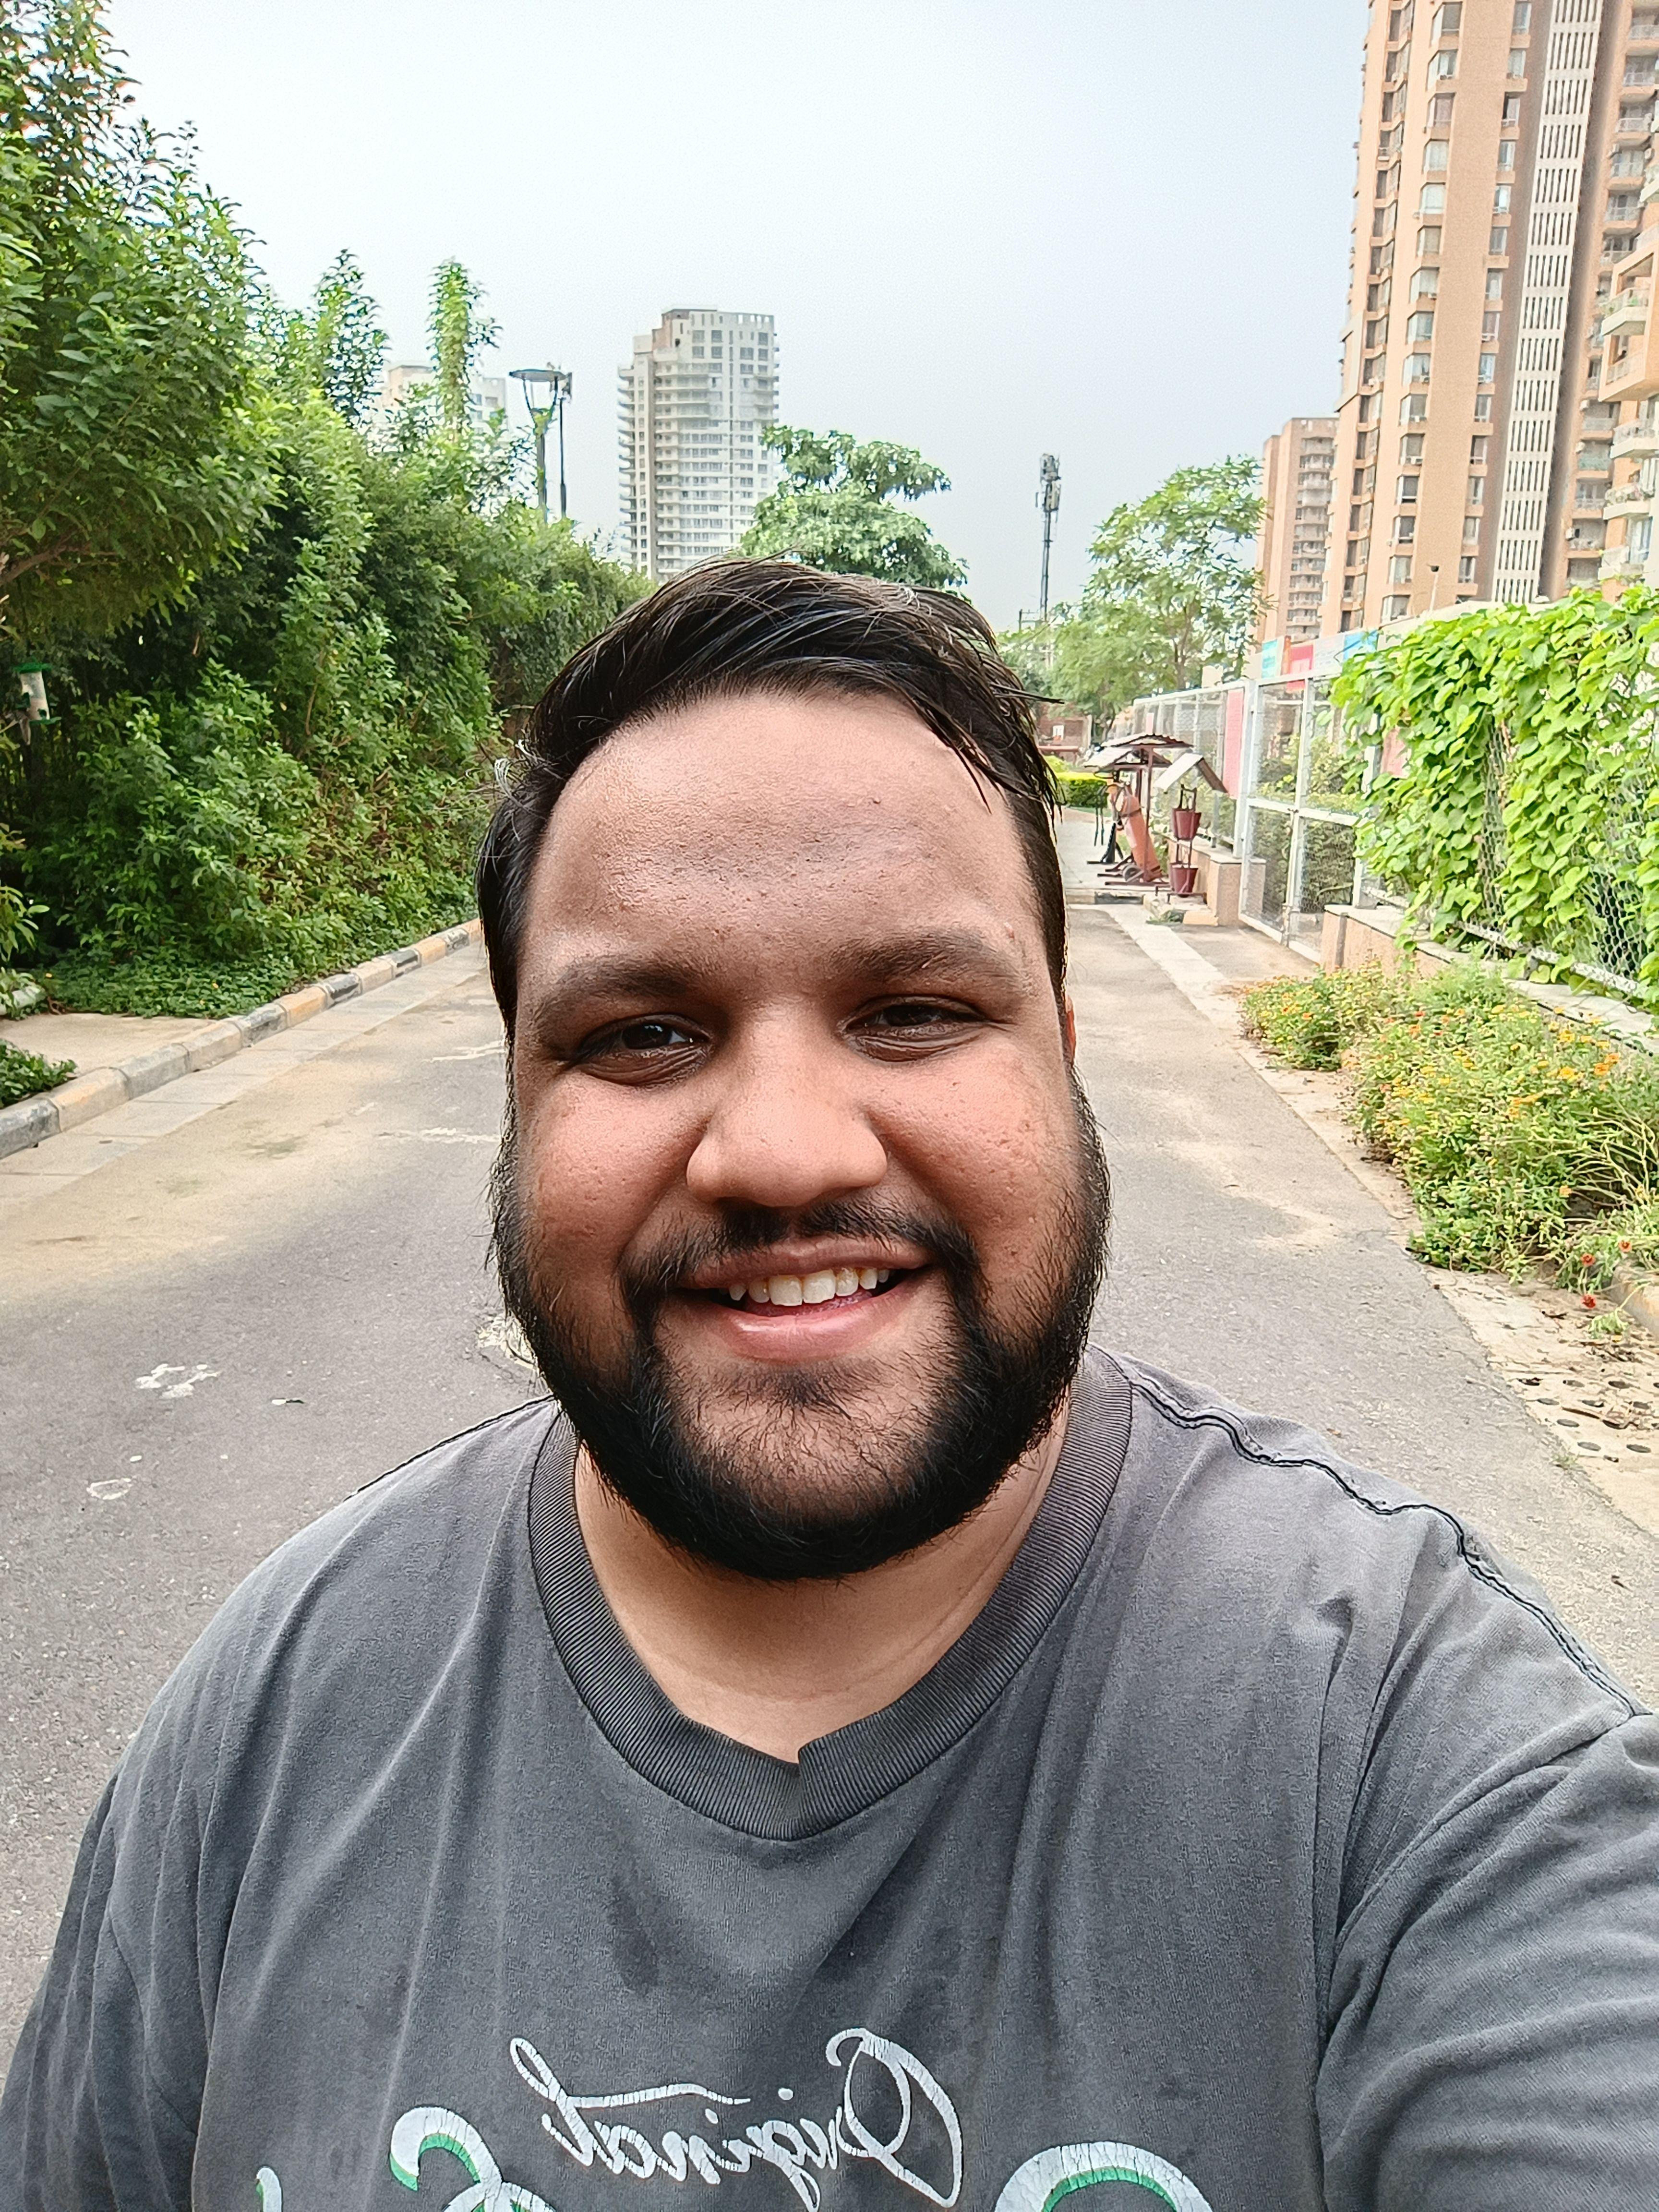 POCO F3 GT selfie